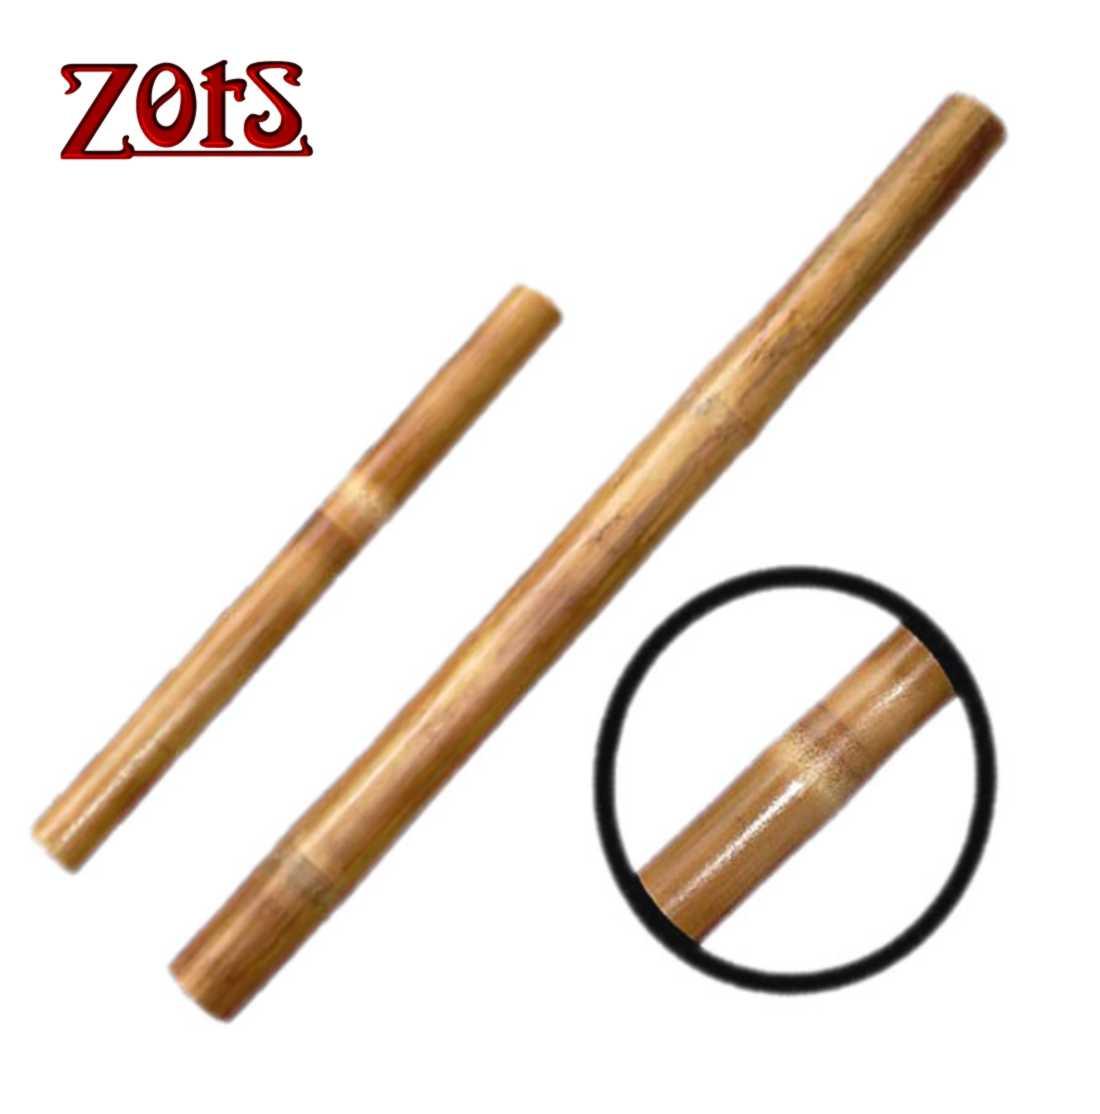 Kit Bambu com 6  -  Zots